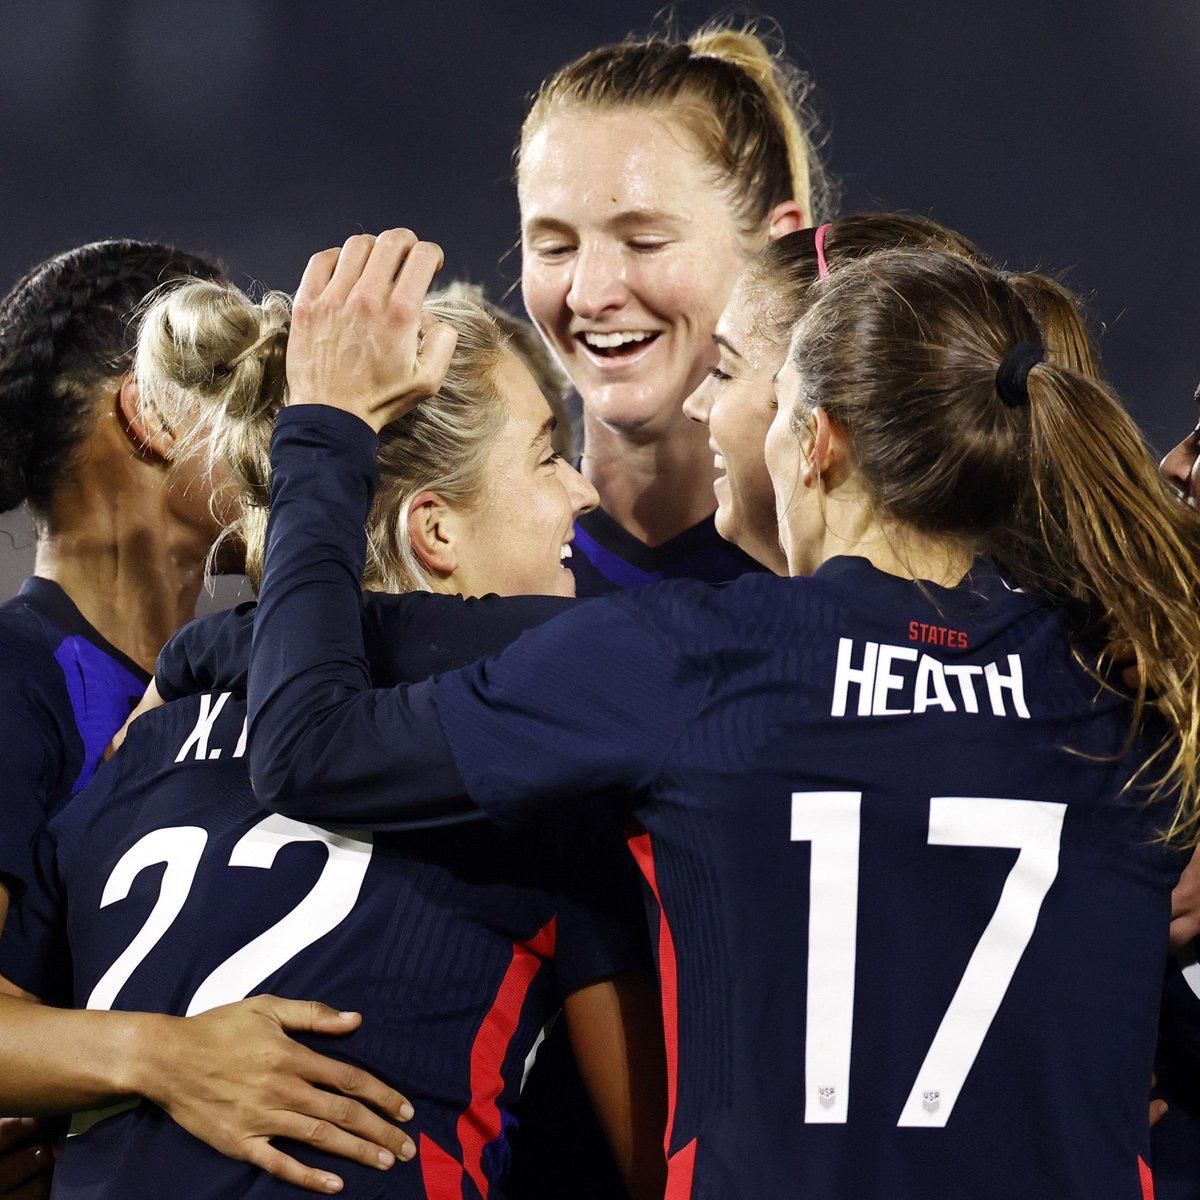 2019: USA 2-0 Netherlands 2020: Netherlands 0-2 USA  @USWNT win the rematch of the World Cup final 👏. #USWNT #NEDUSA